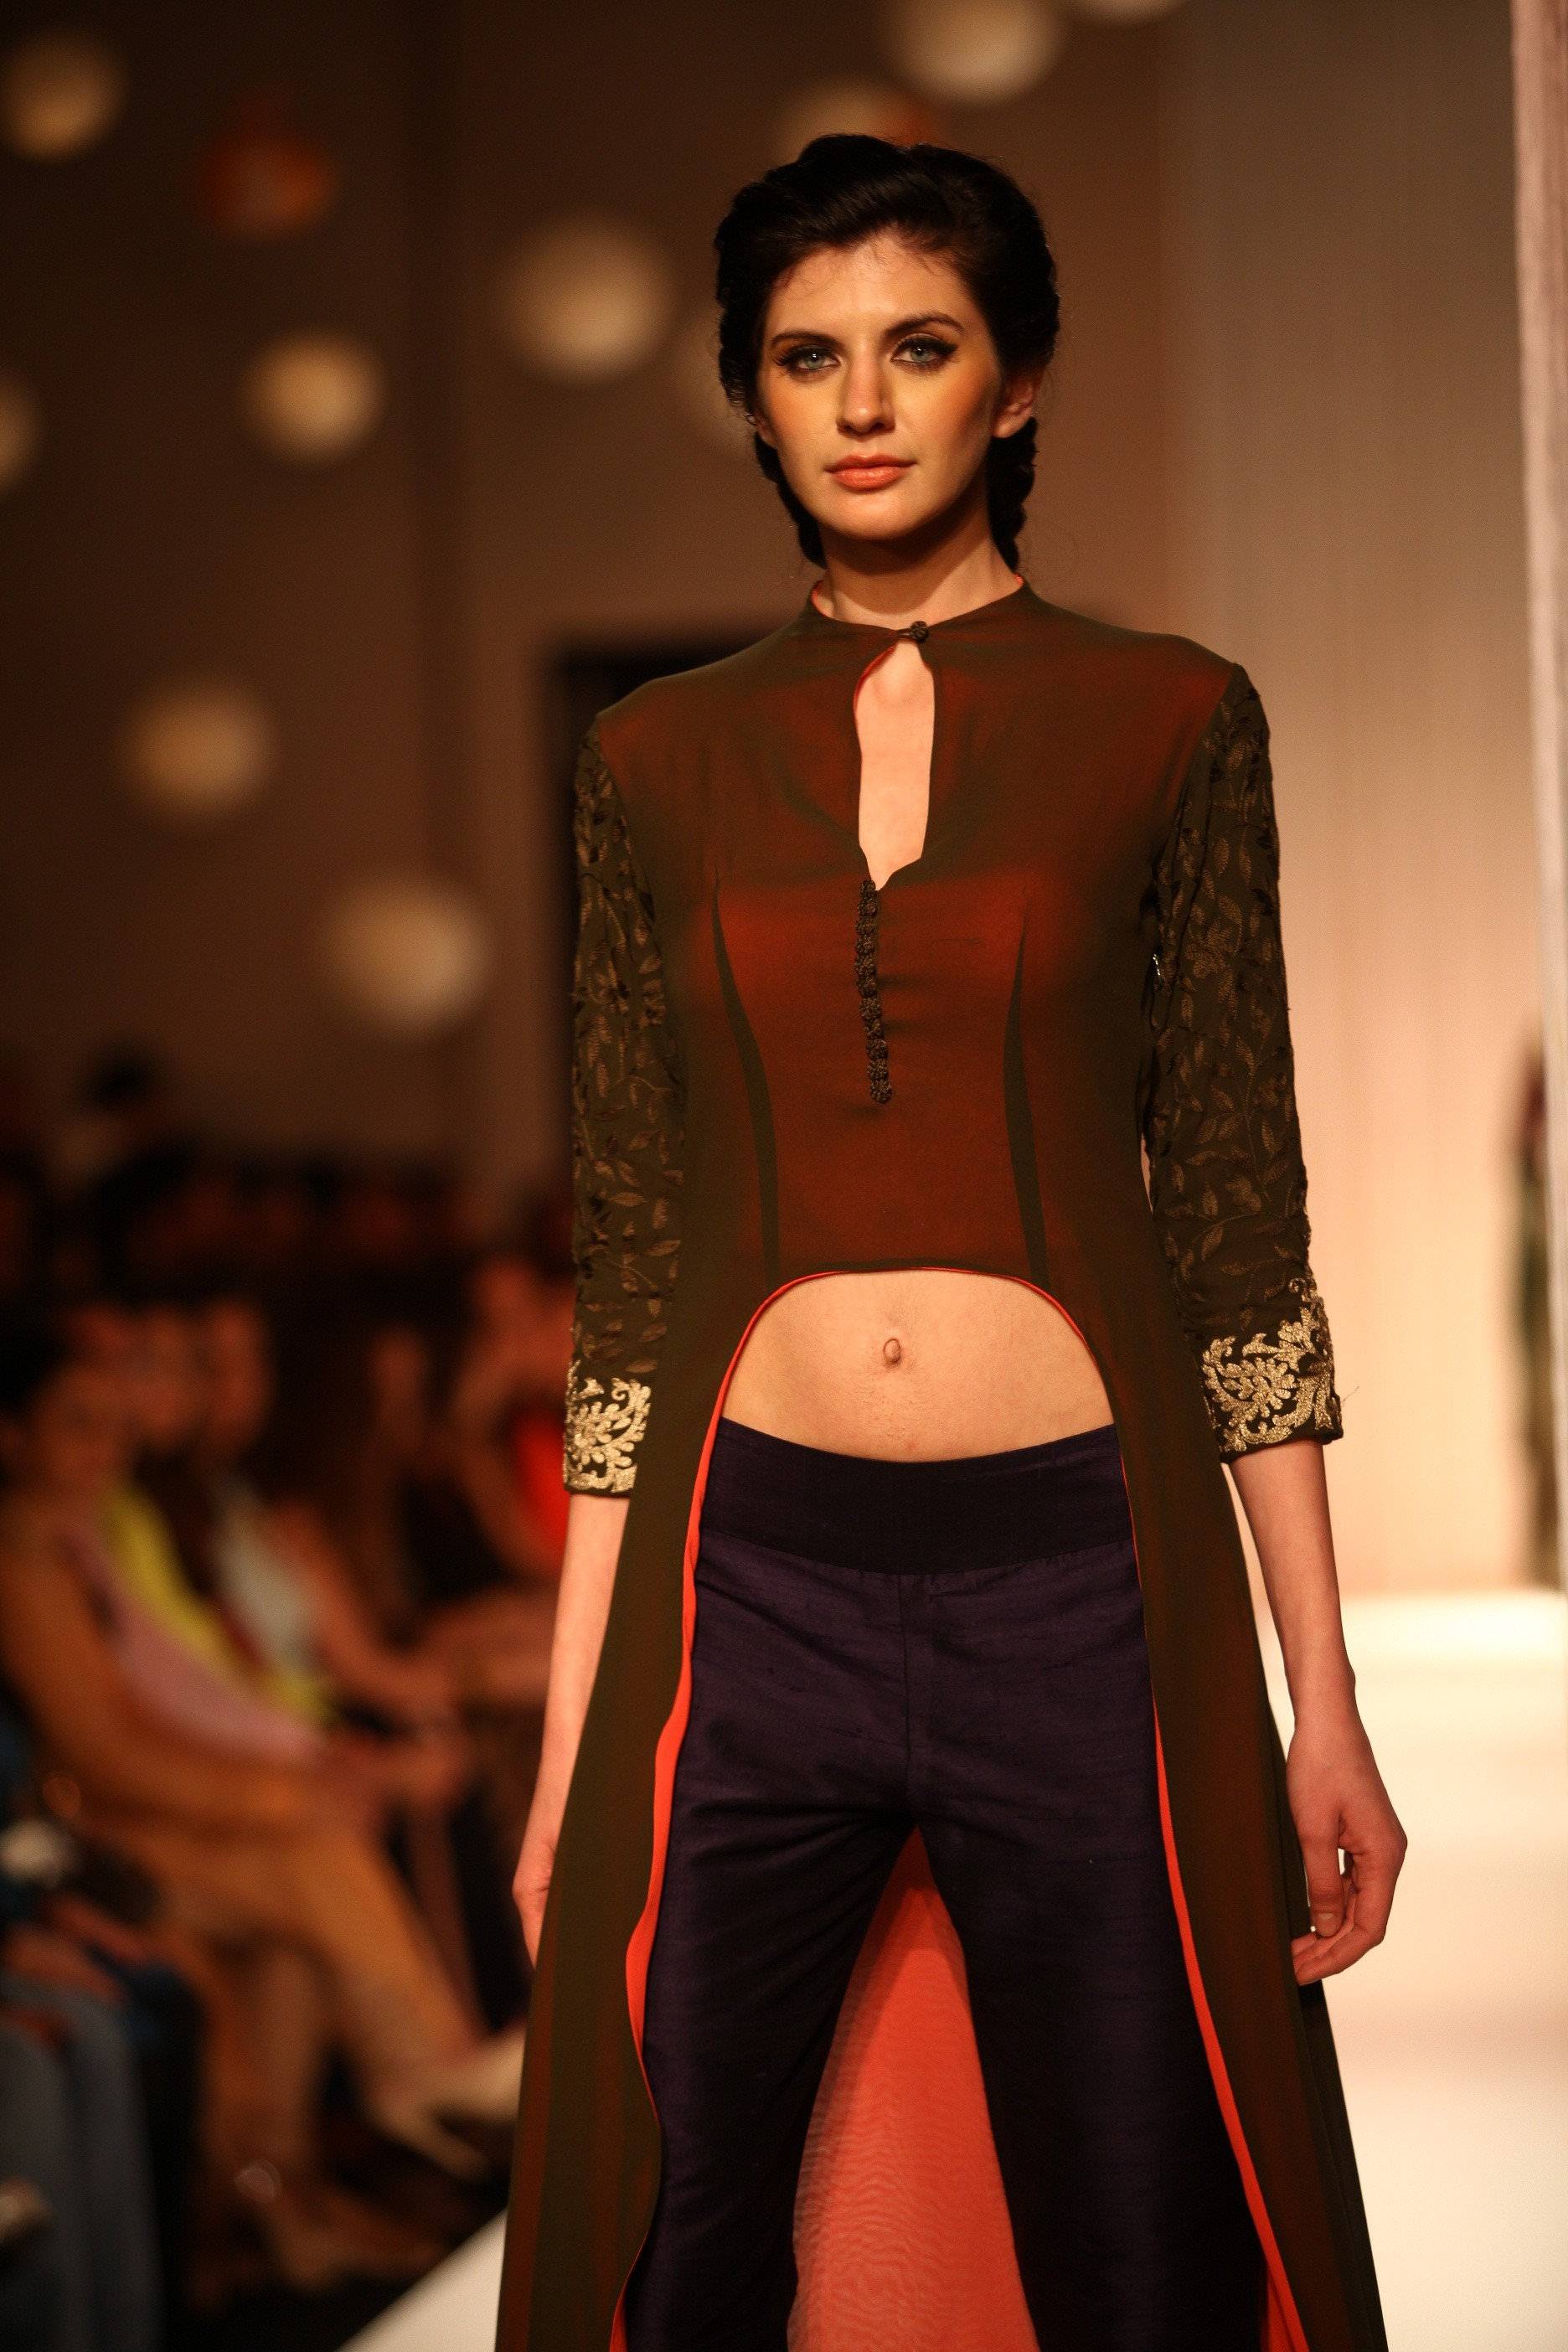 Manish Malhotra opens the Lakme Fashion Week Winter/ Festive